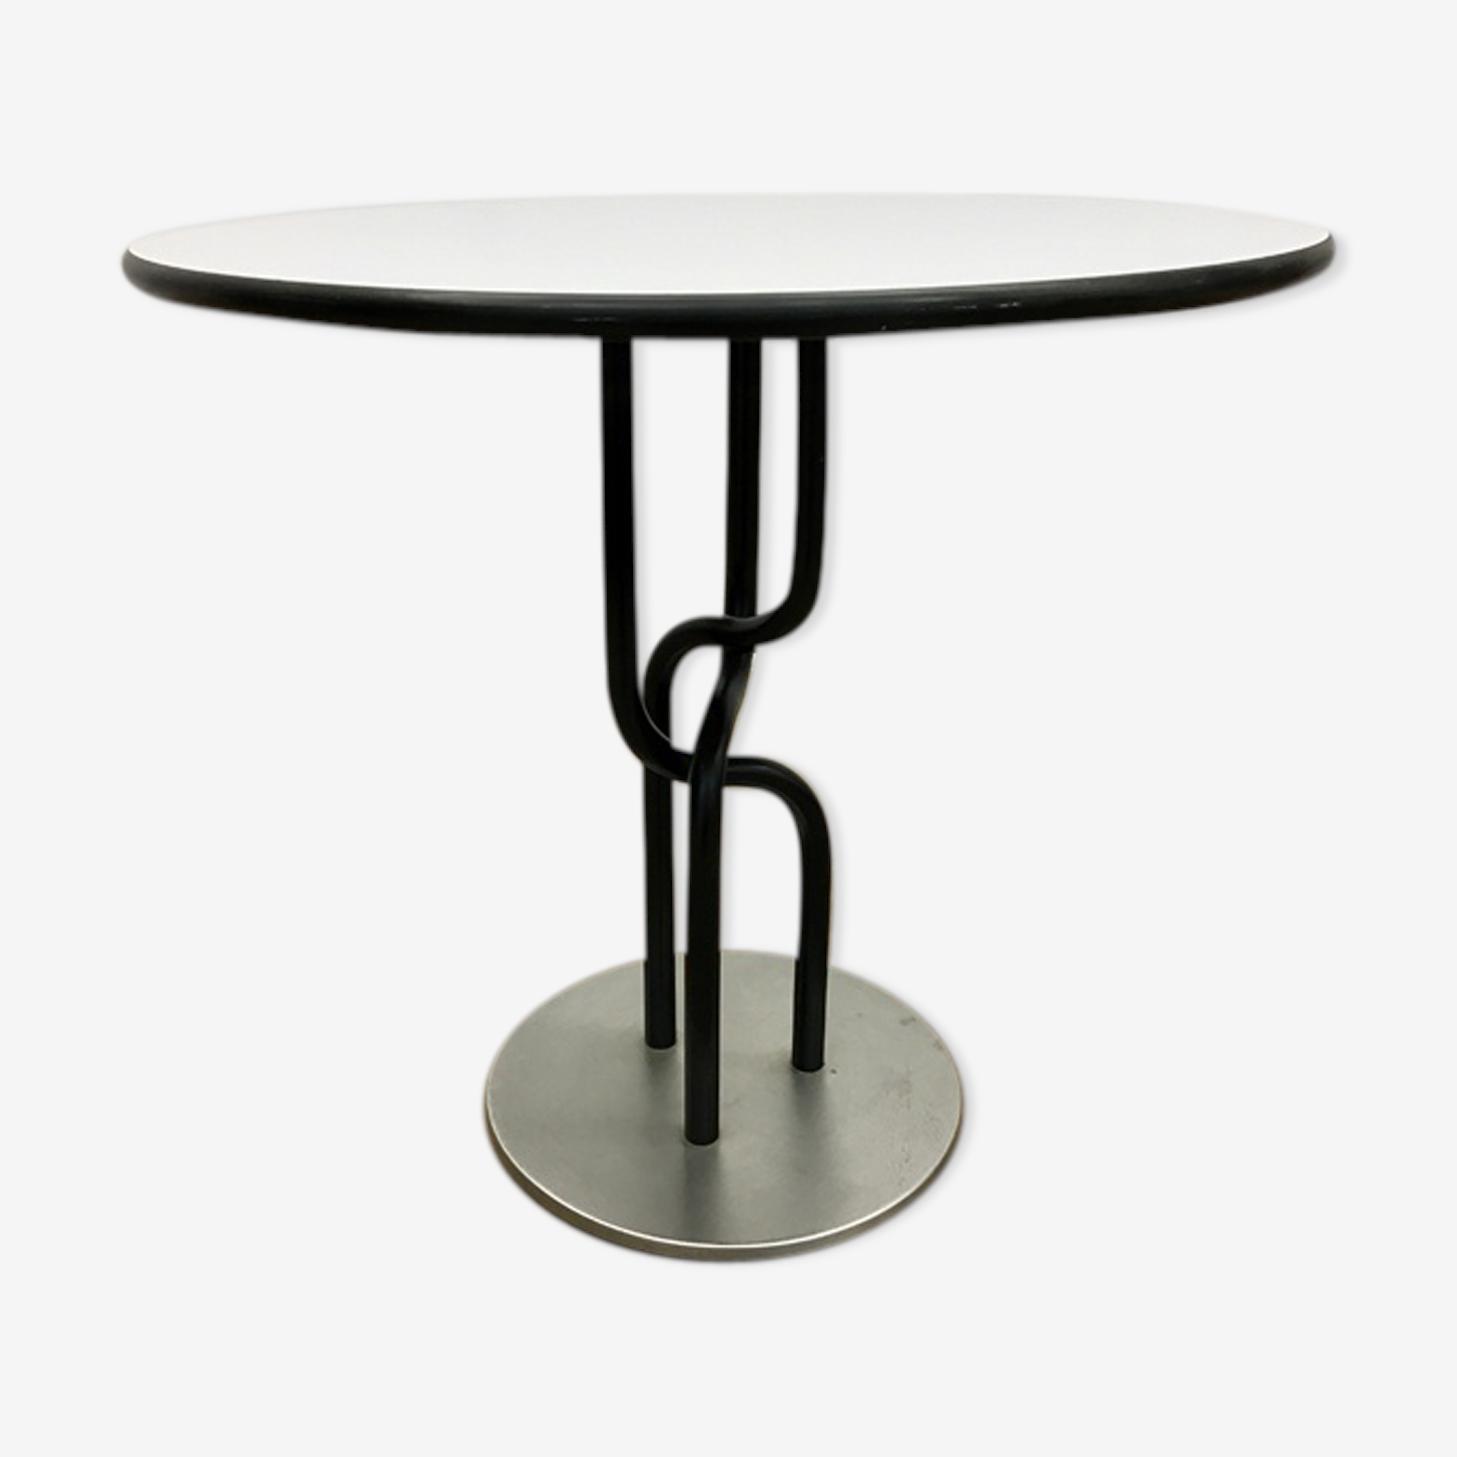 Coffee table by Rud Thygesen and Johnny Sorensen Denmark 1989